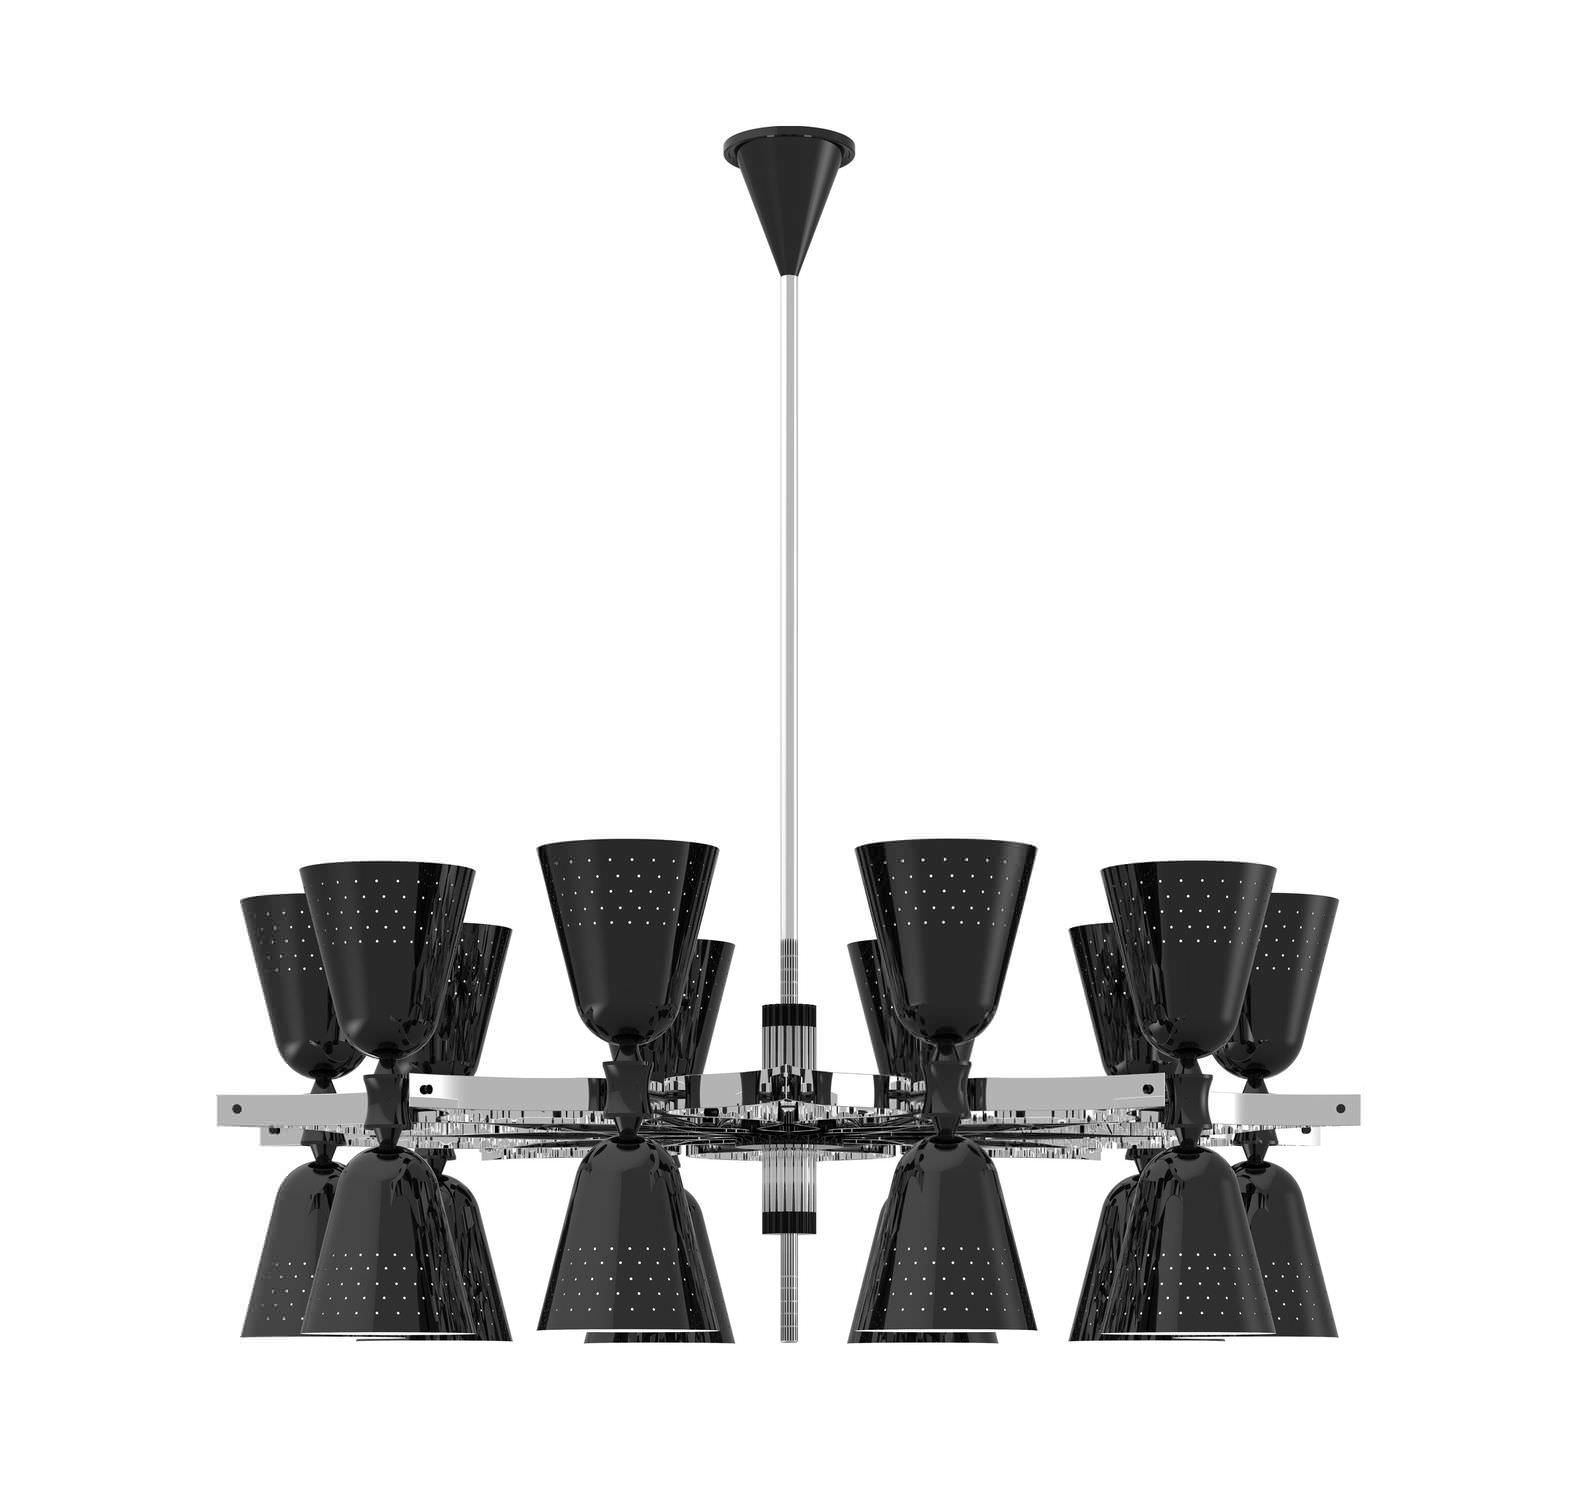 Lovable Black Contemporary Chandelier Black Glass Modern In Black Contemporary Chandelier (#9 of 12)